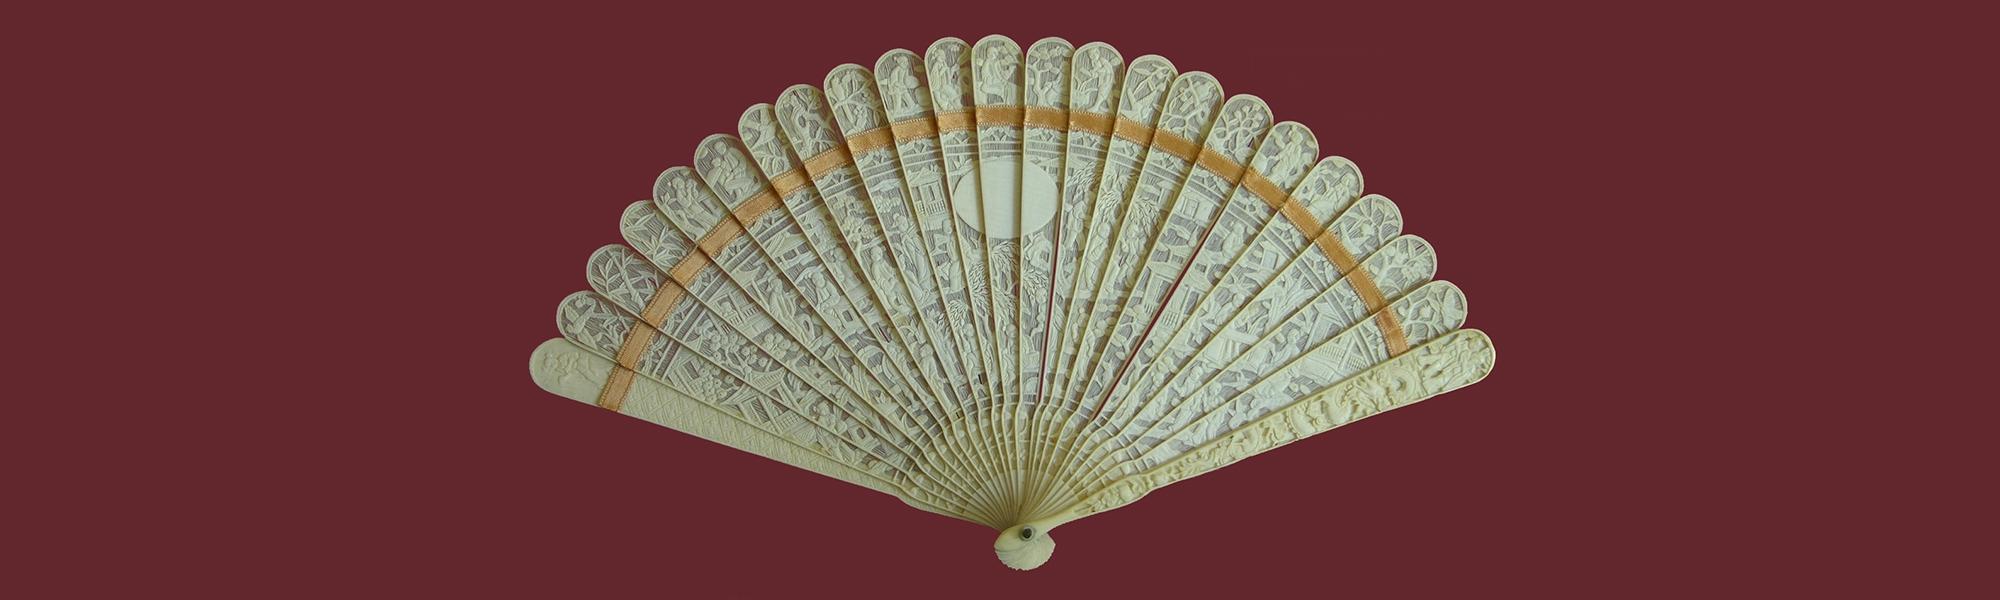 Cina avorio 1810